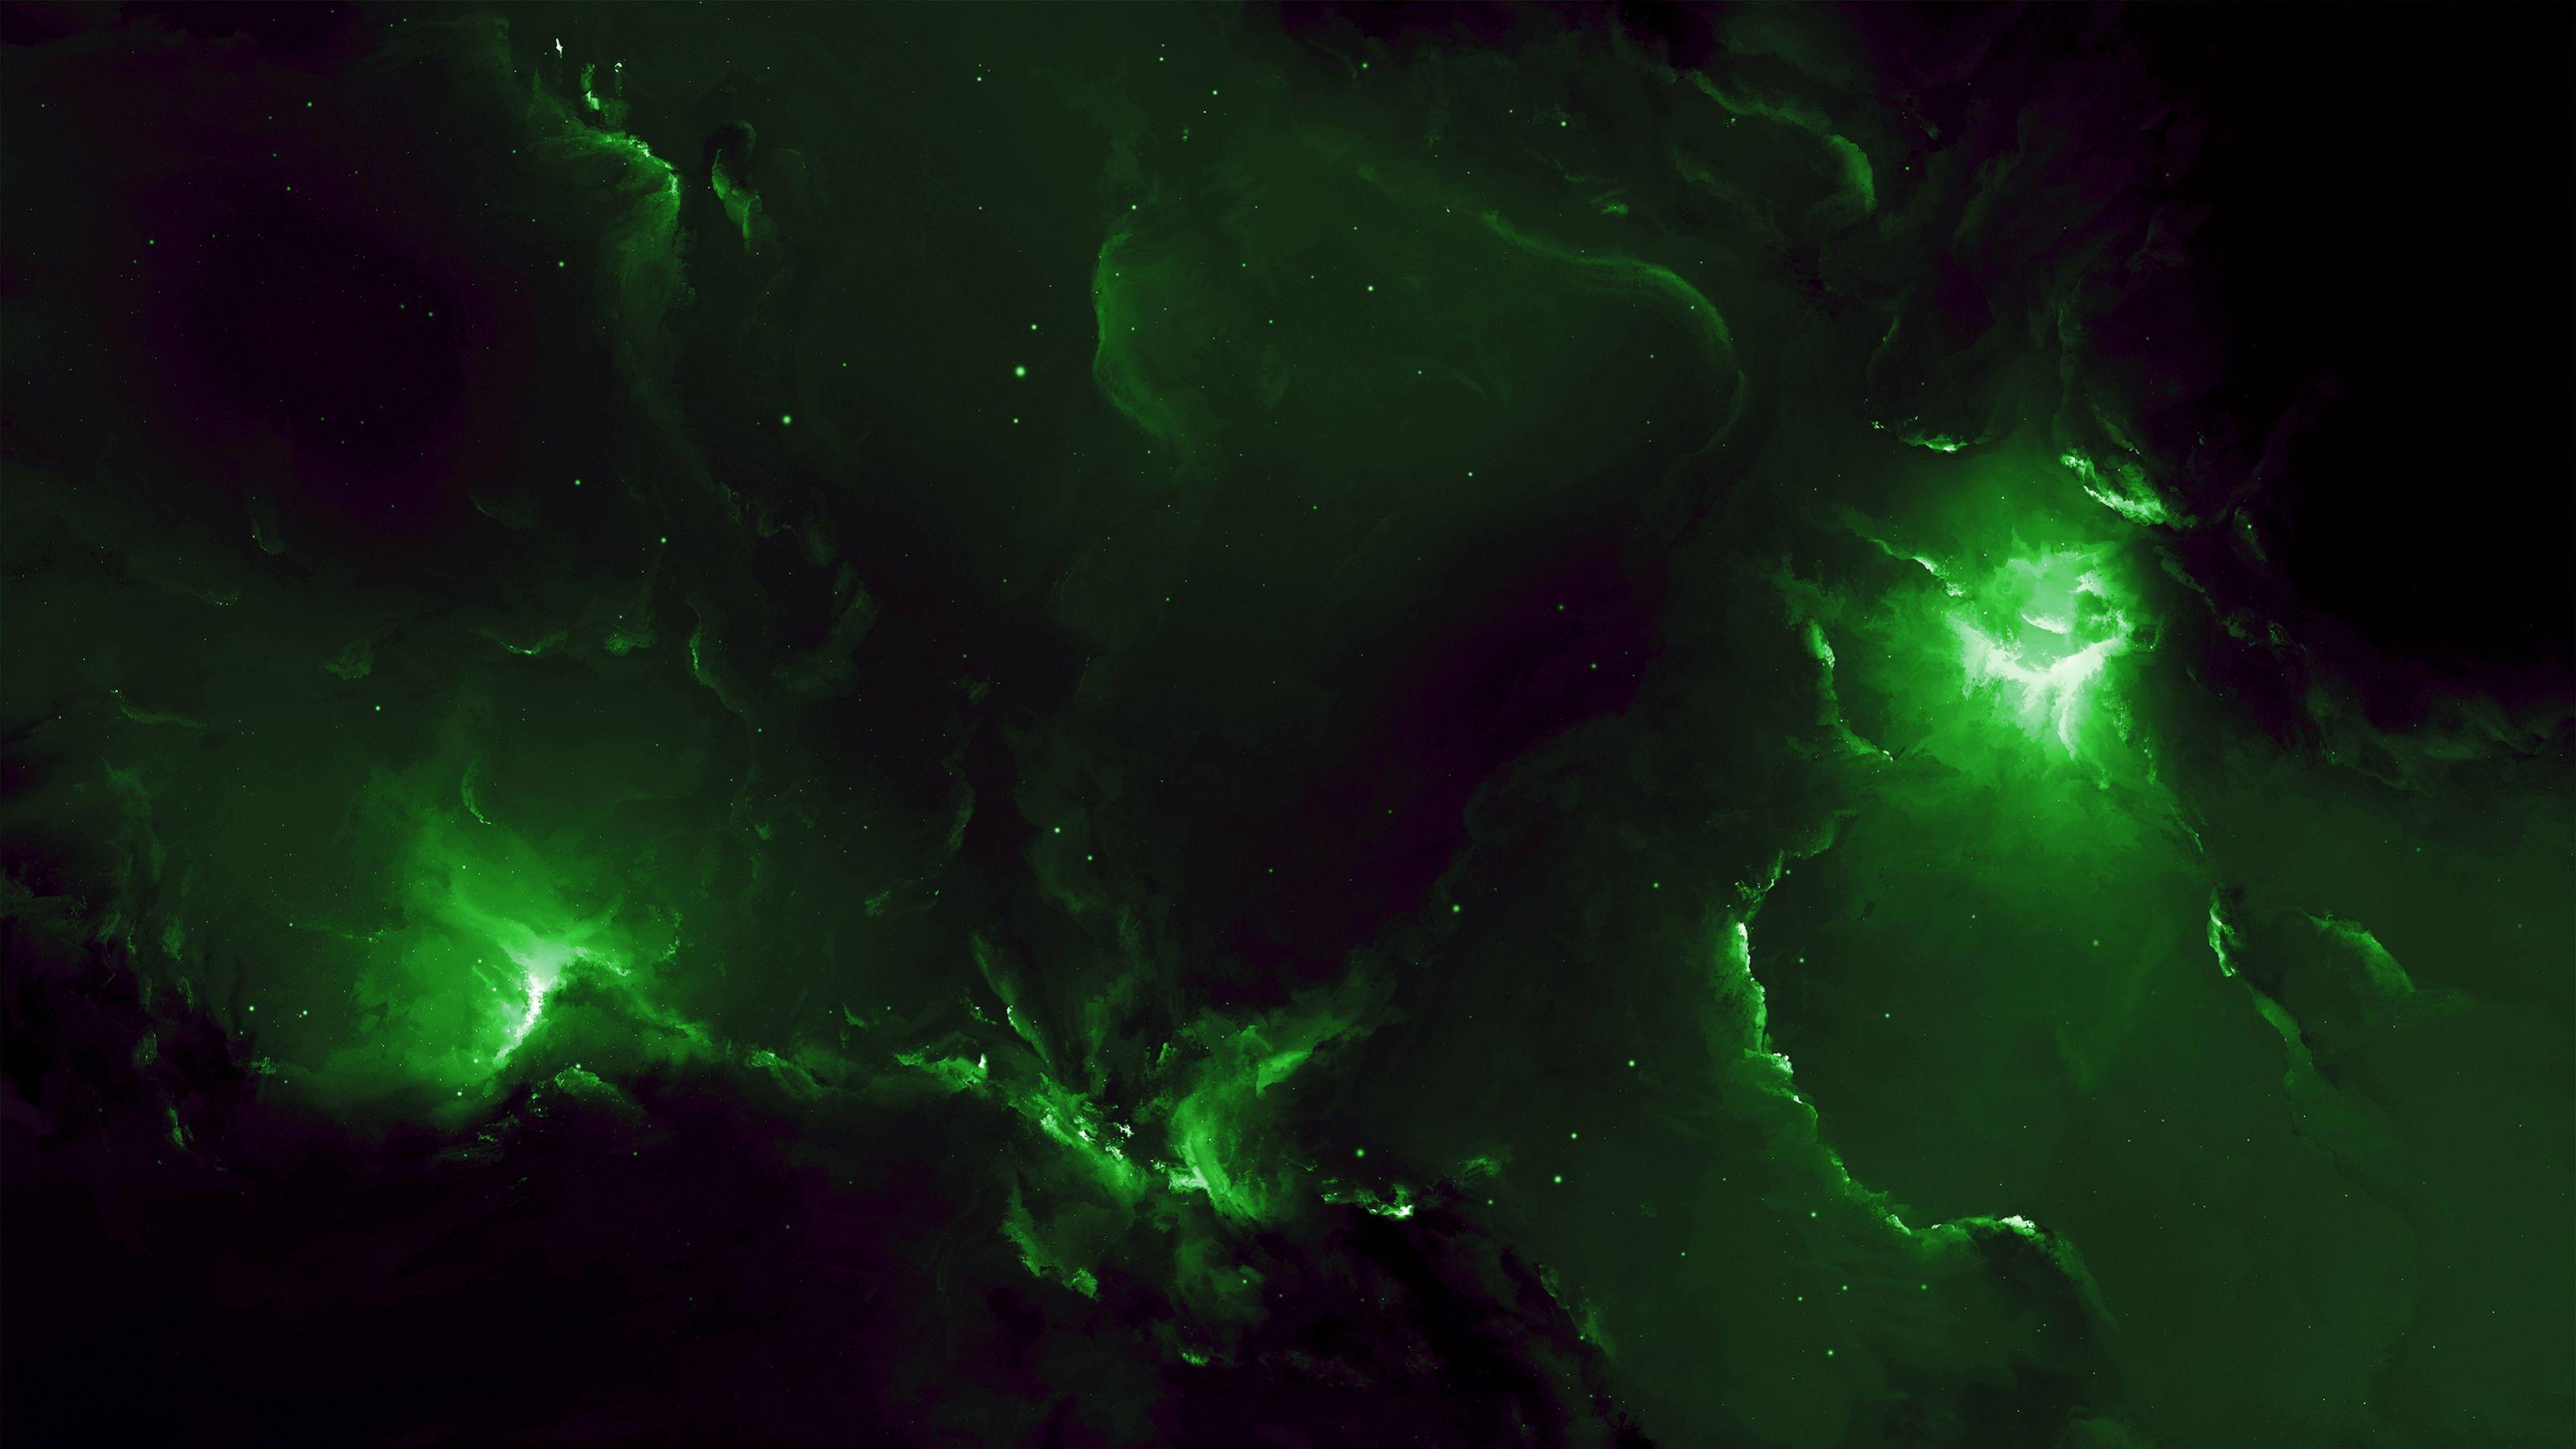 3200x1800 HD Wallpaper Green - WallpaperSafari